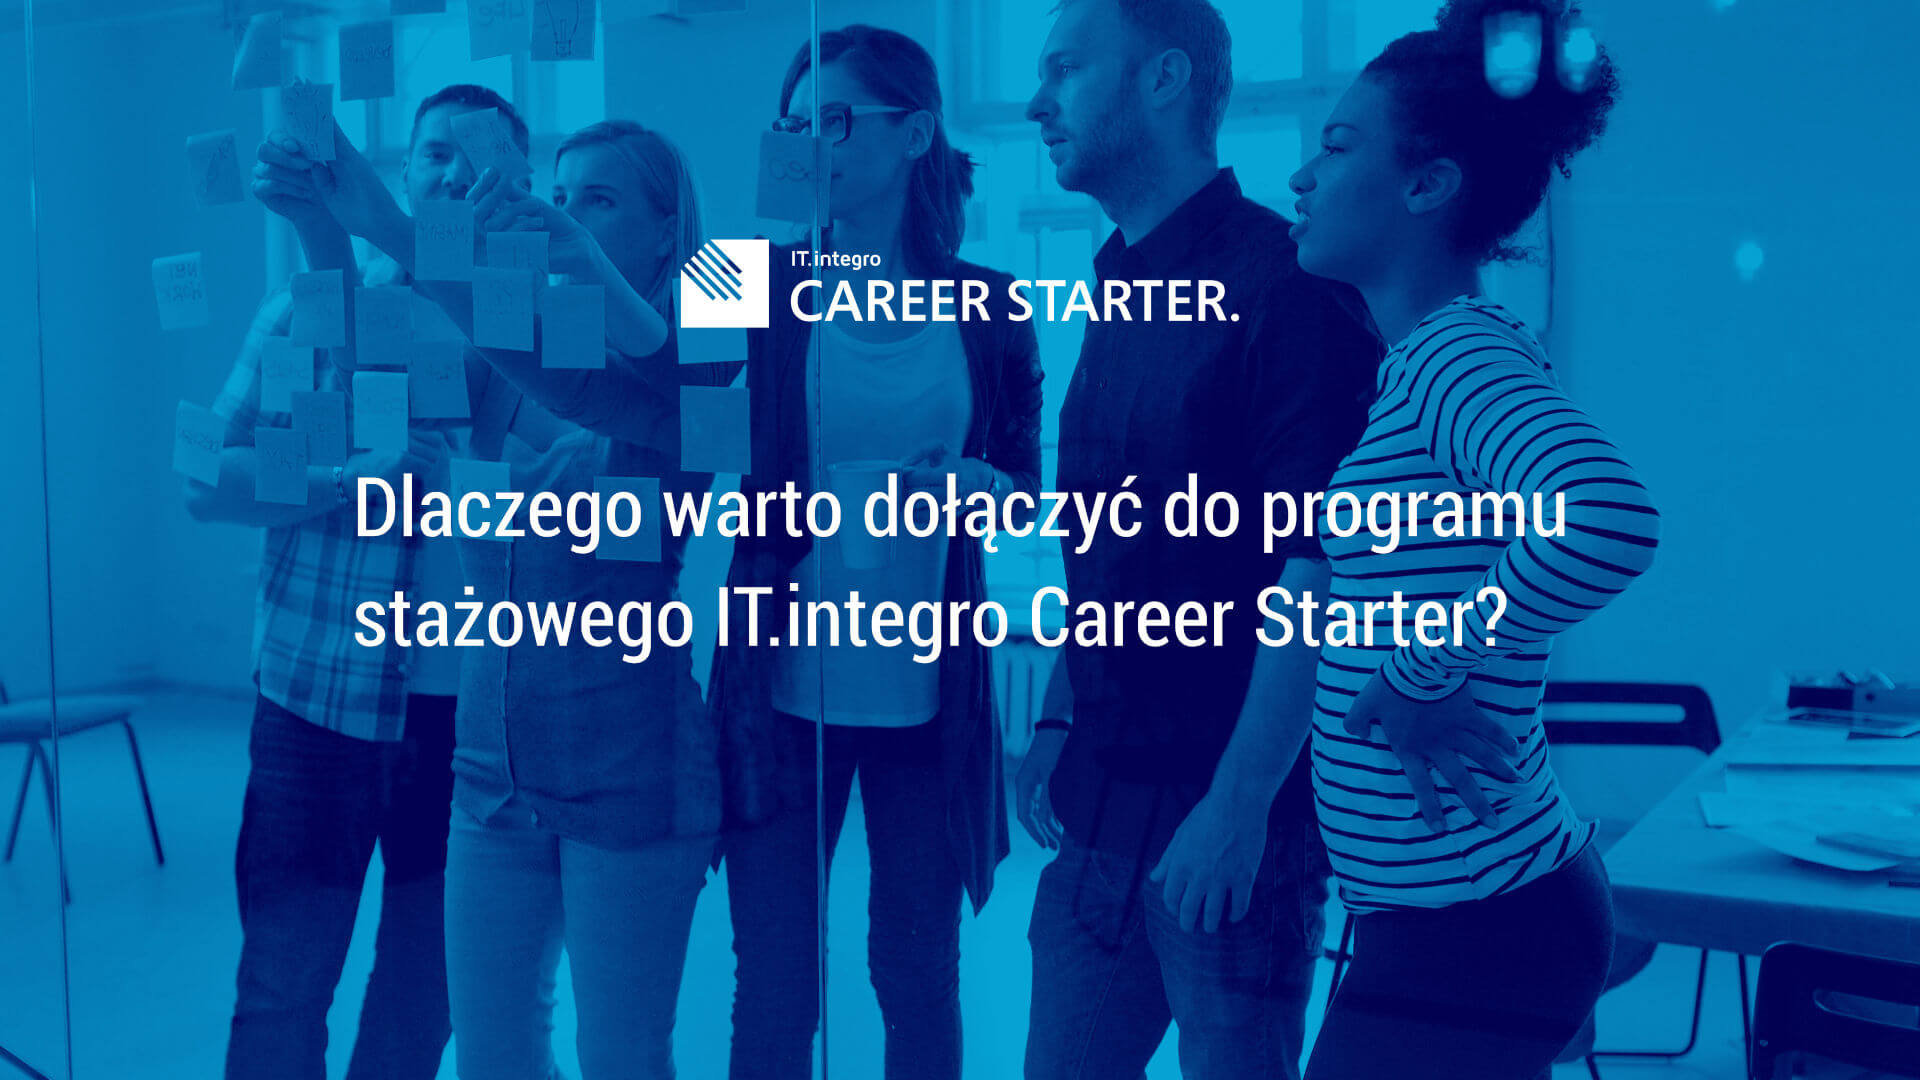 Program stażowy IT.integro Career Starter